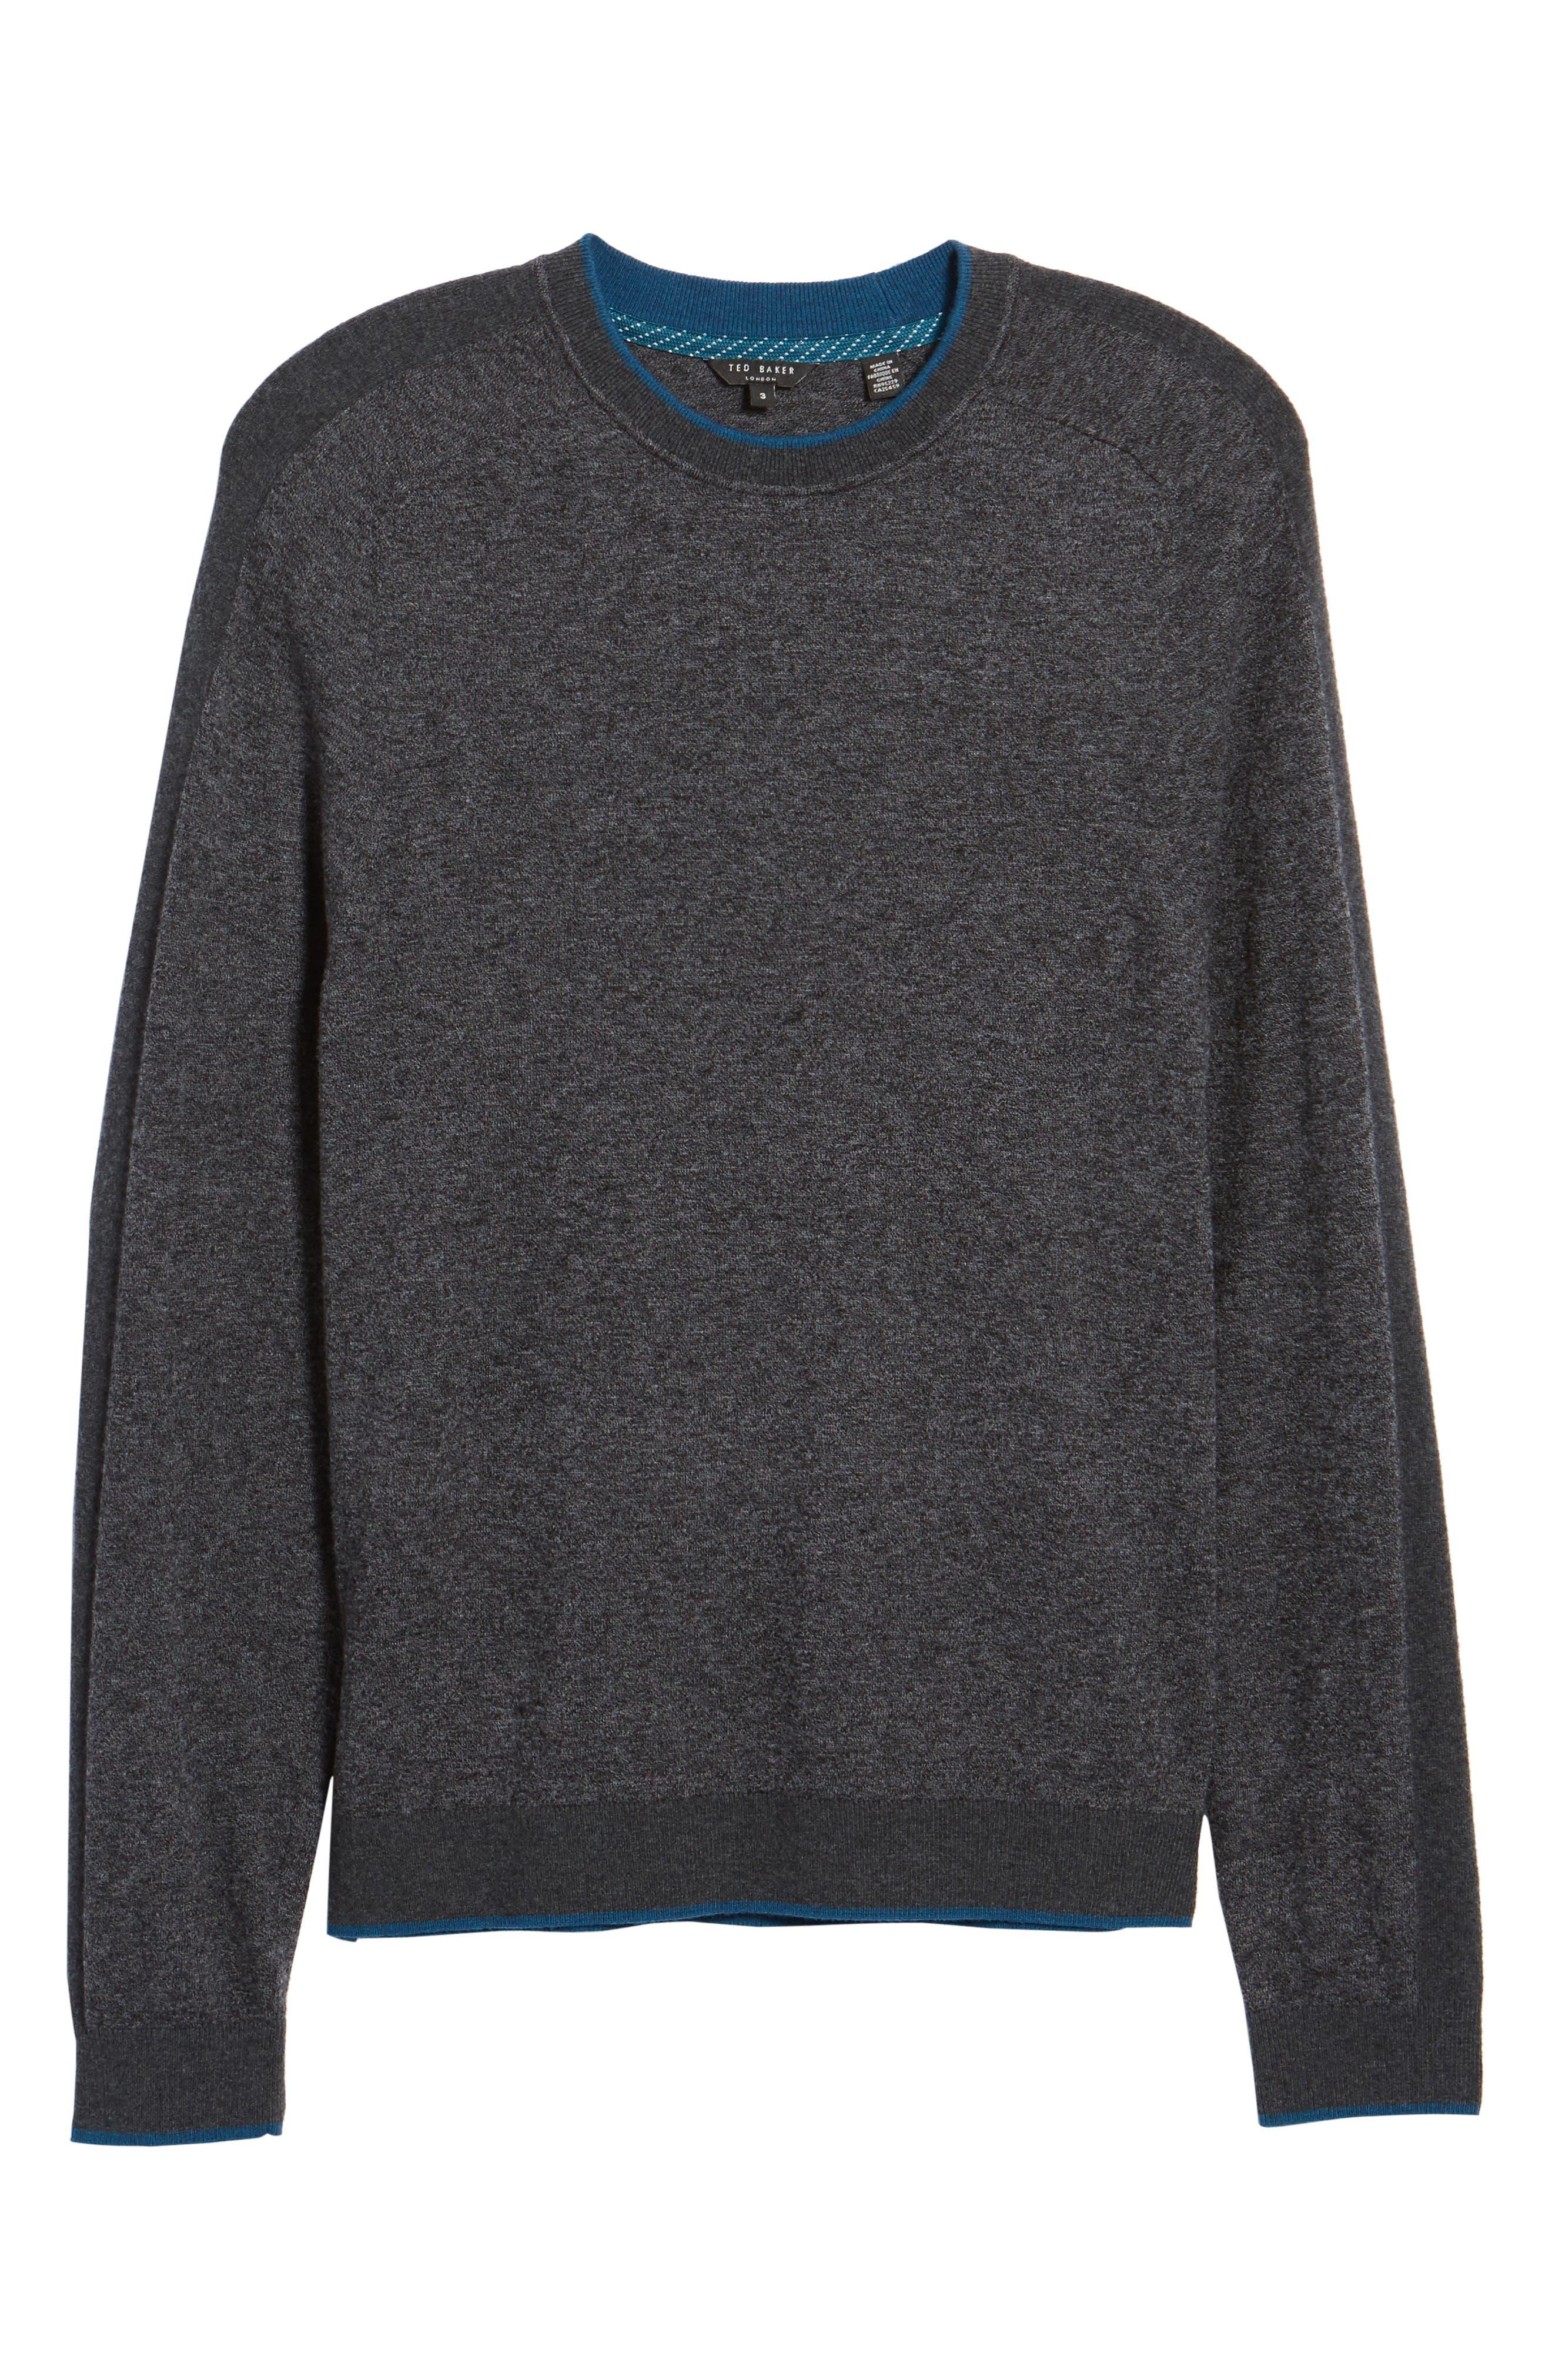 Norpol Crewneck Sweater,                             Alternate thumbnail 6, color,                             010